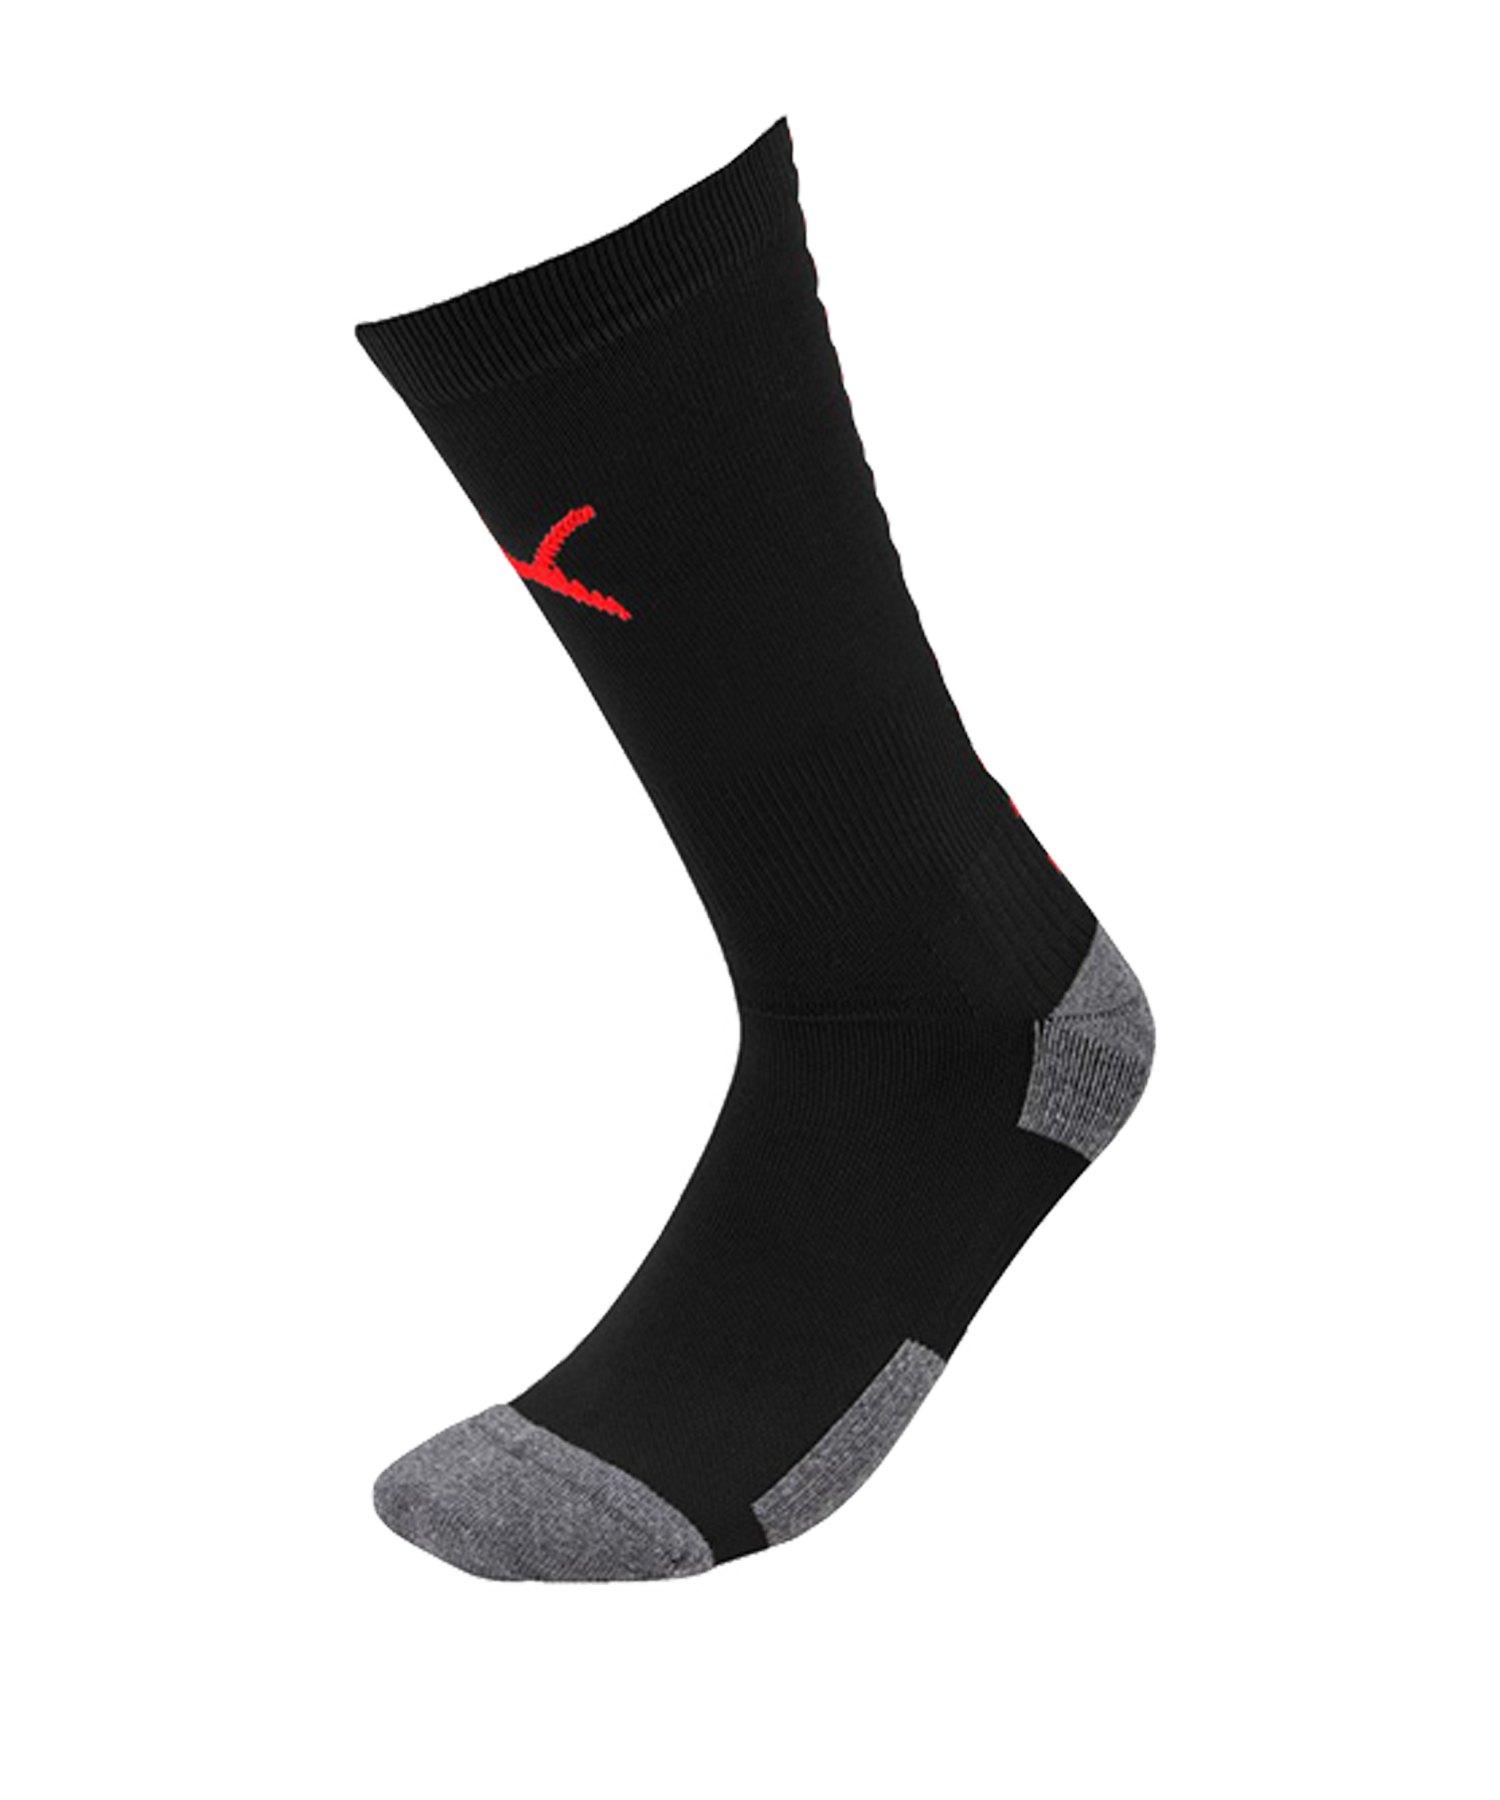 PUMA ftblNXT Team Socks Socken Schwarz Rot F01 - schwarz